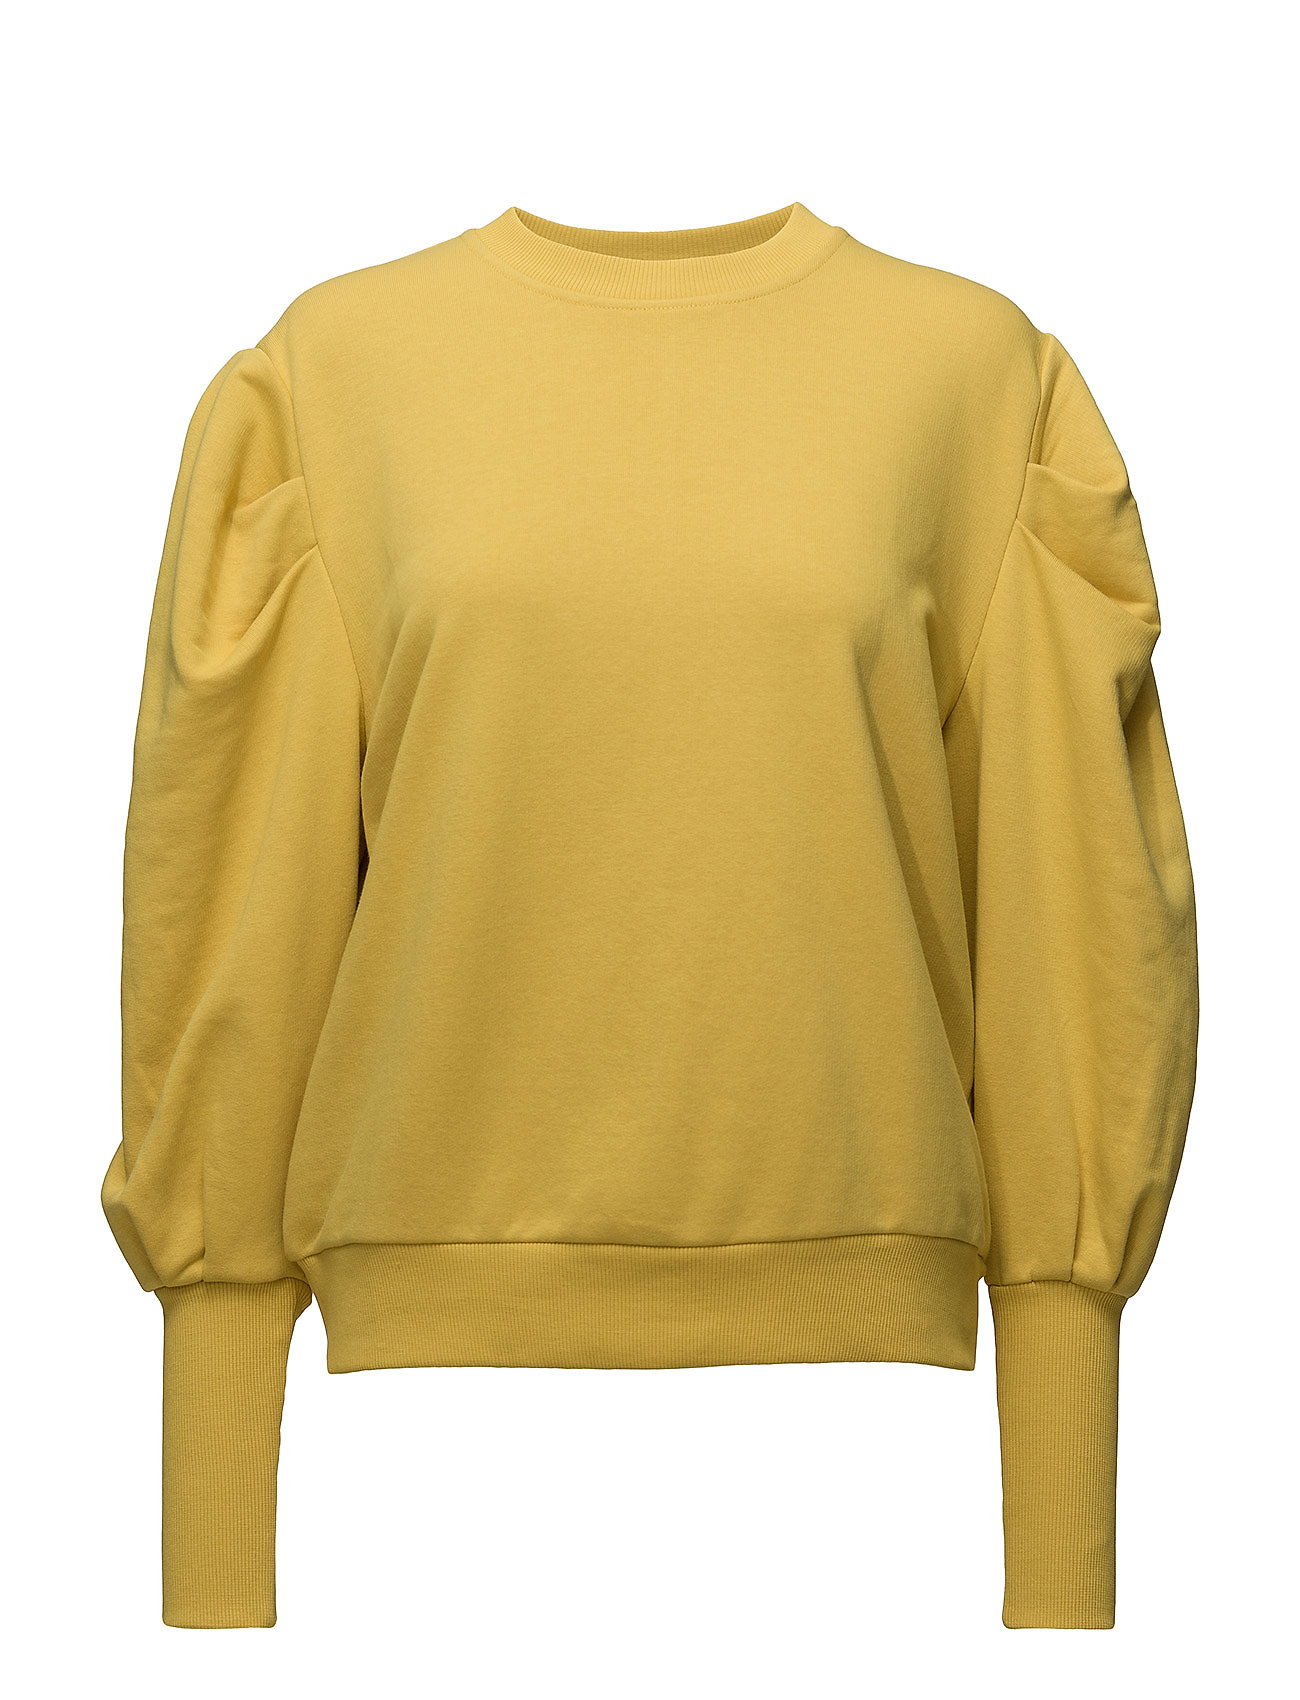 Puffed-Shoulder Sweatshirt Mango  til Damer i Gul